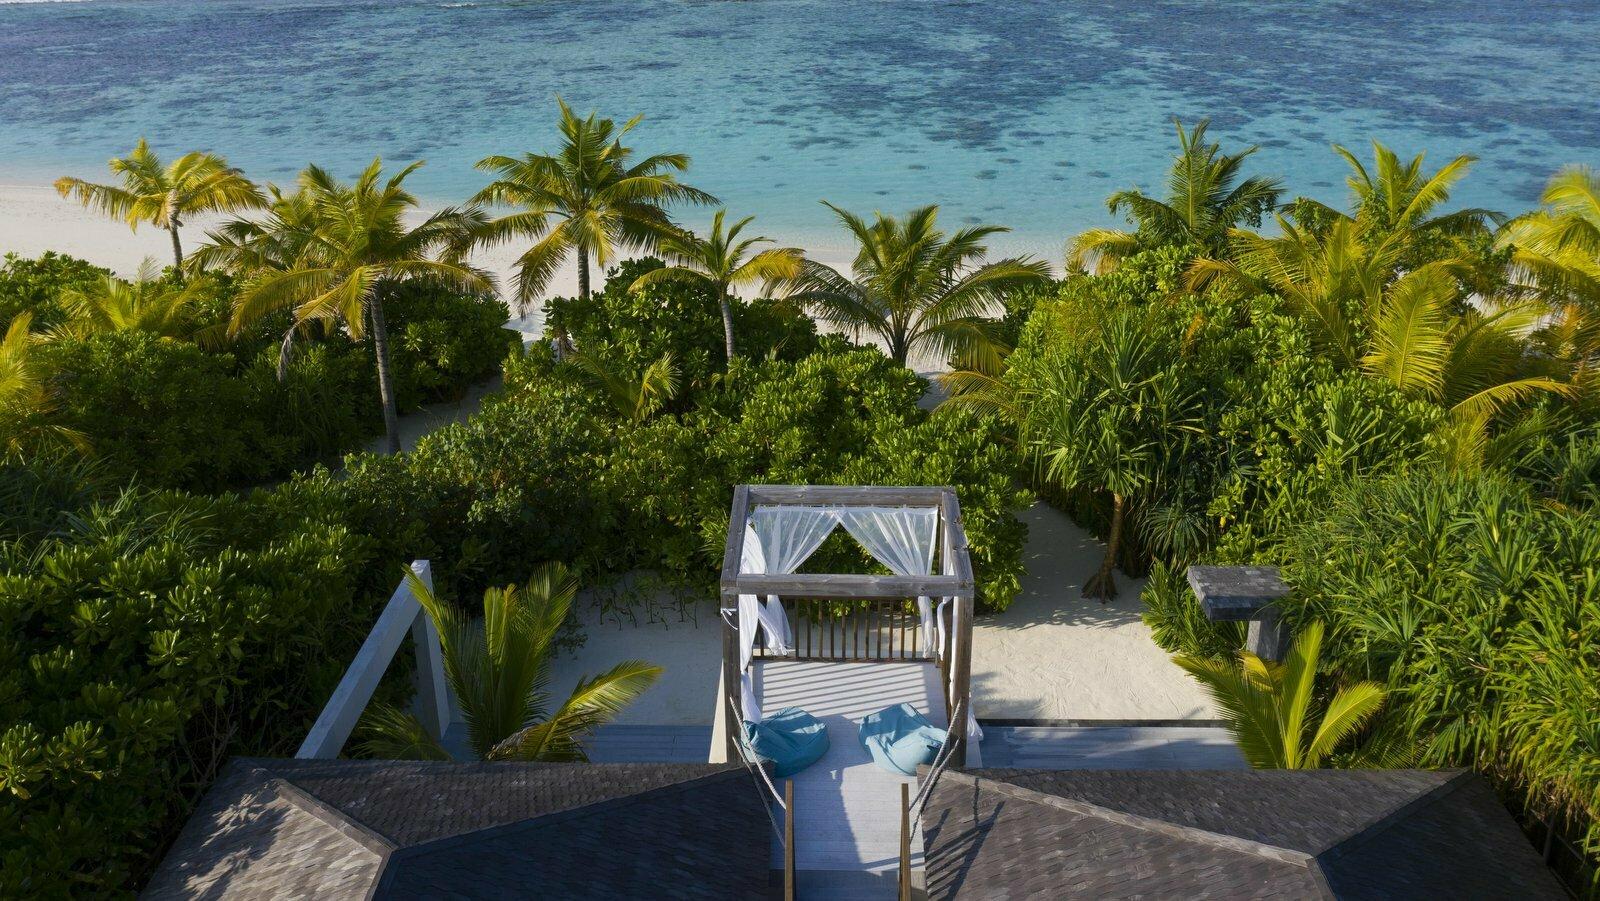 Мальдивы, отель Movenpick Resort Kuredhivaru Maldives, номер Beach Pool Suite